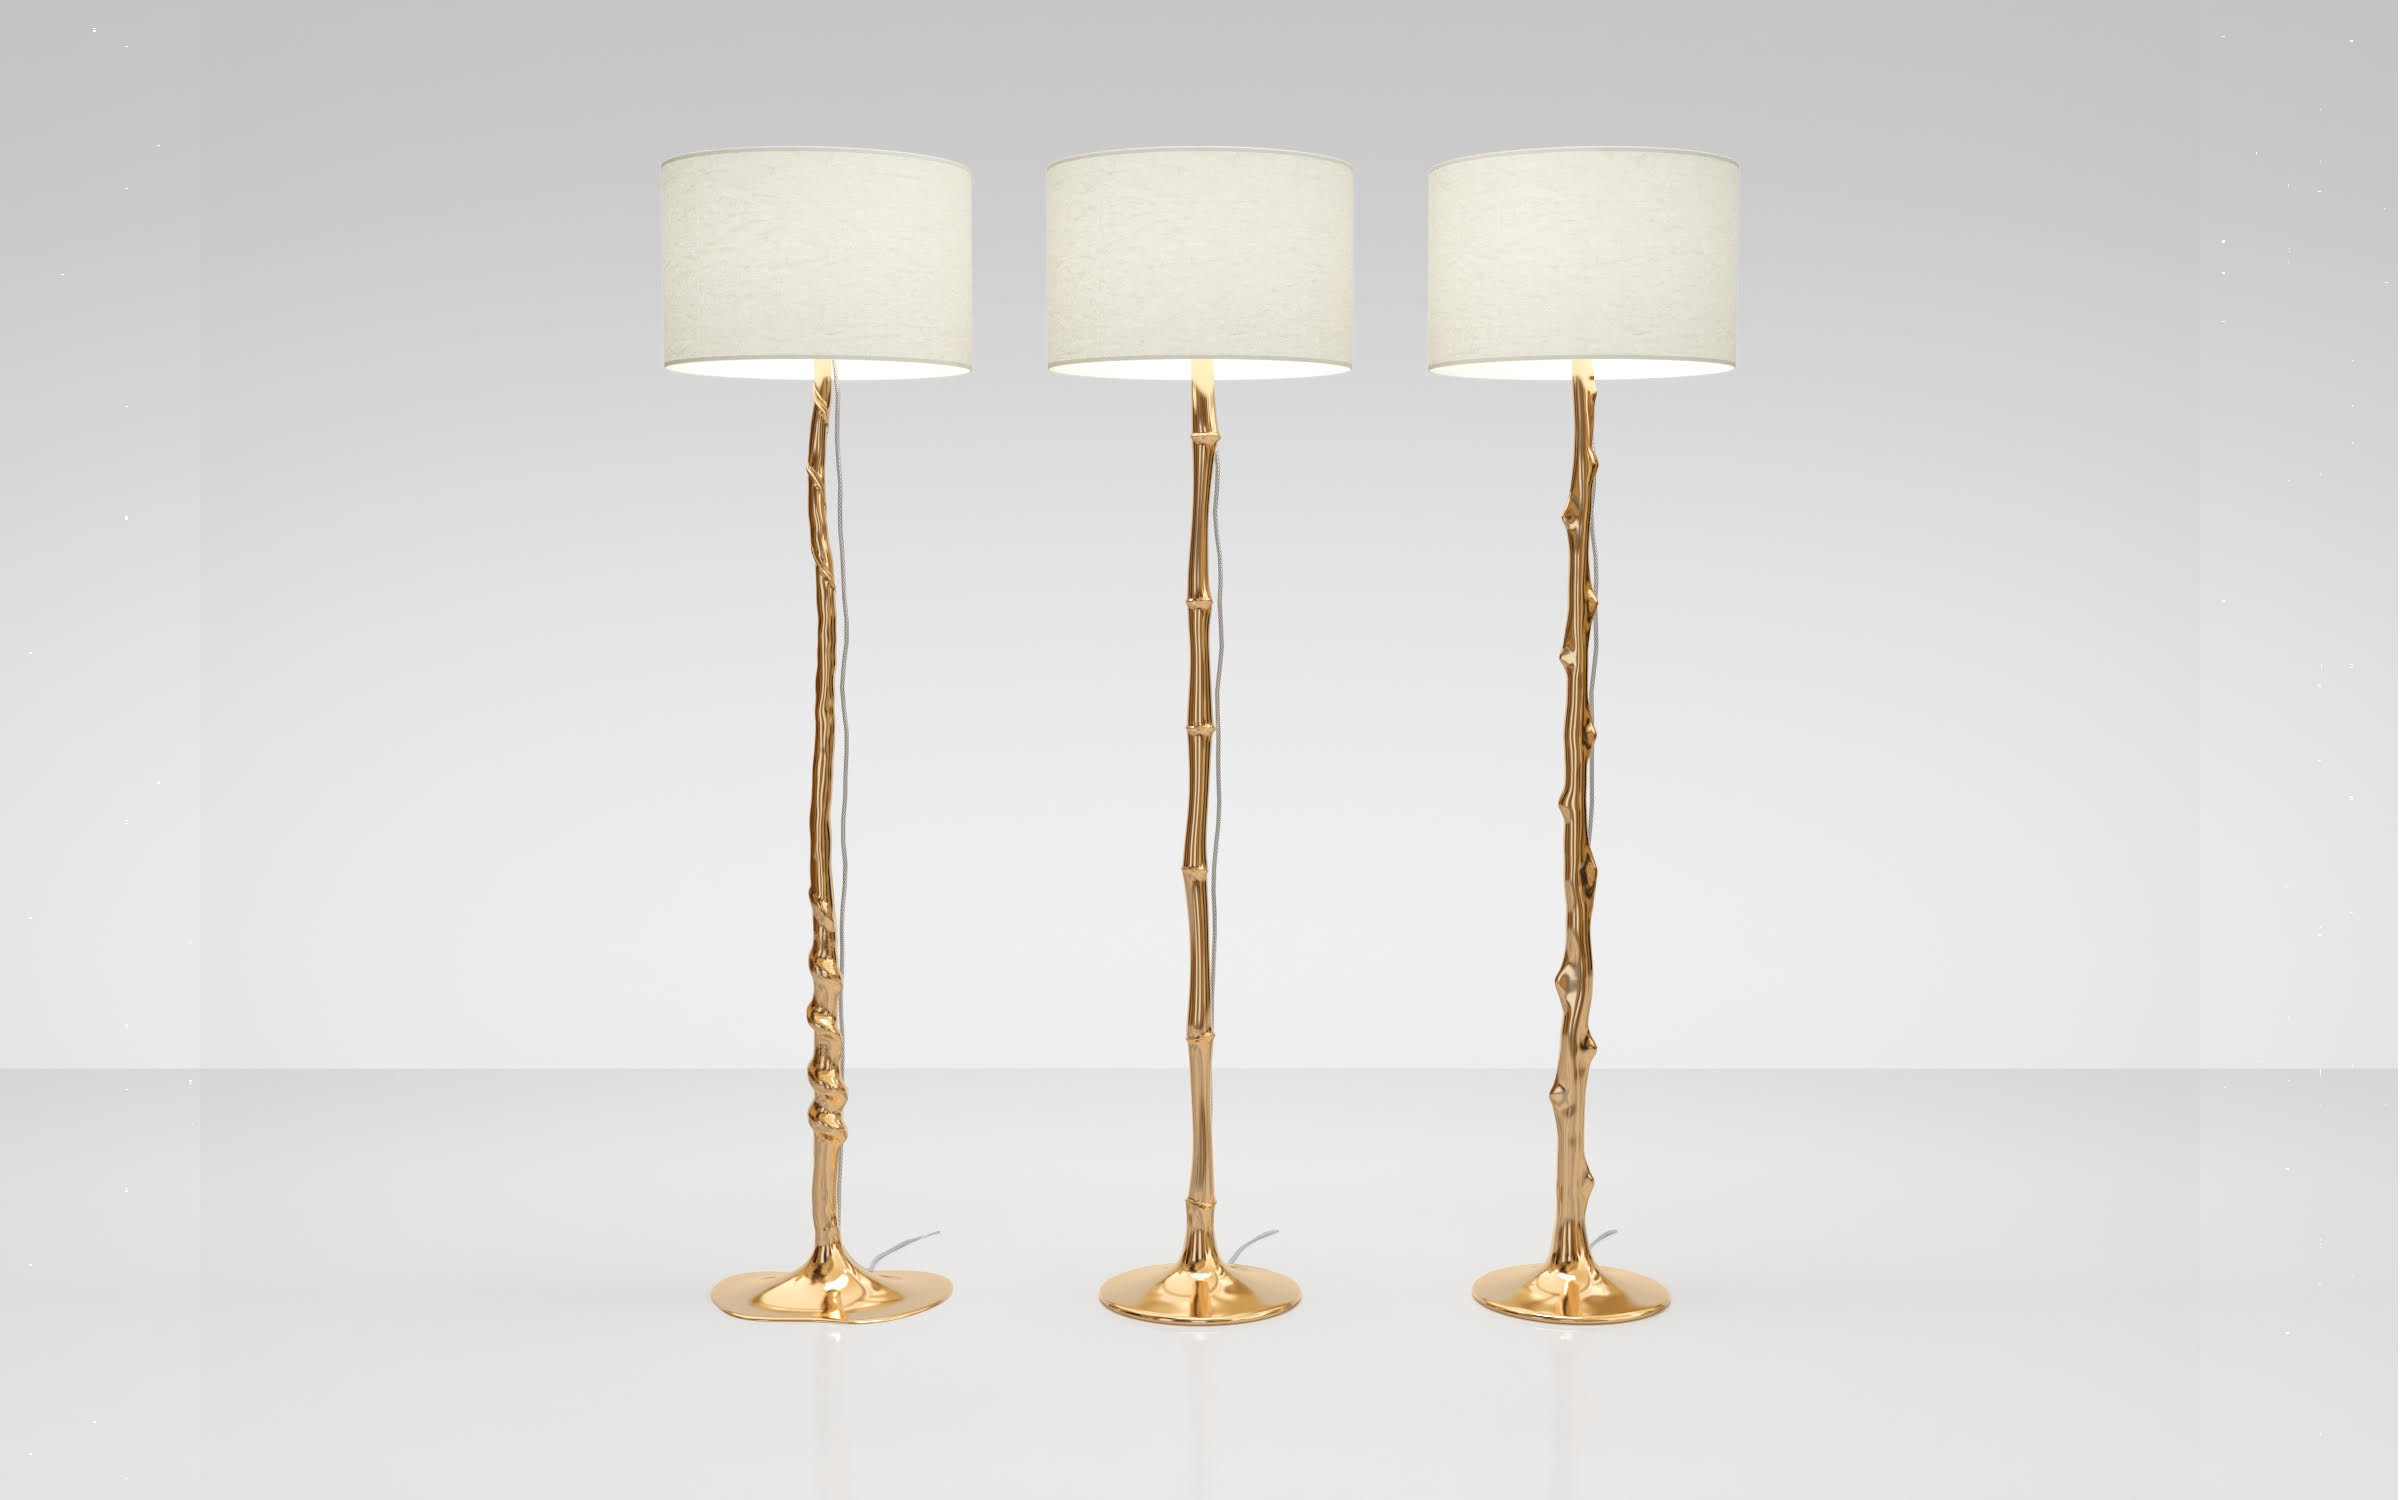 lamps3 Creative Accessories